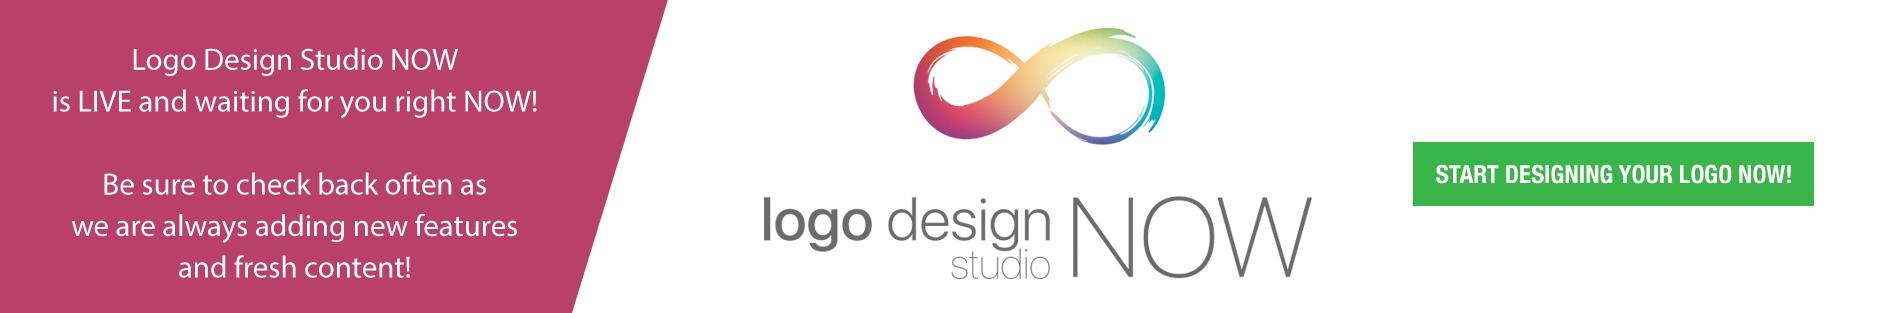 Coming Soon - Logo Design Studio Now